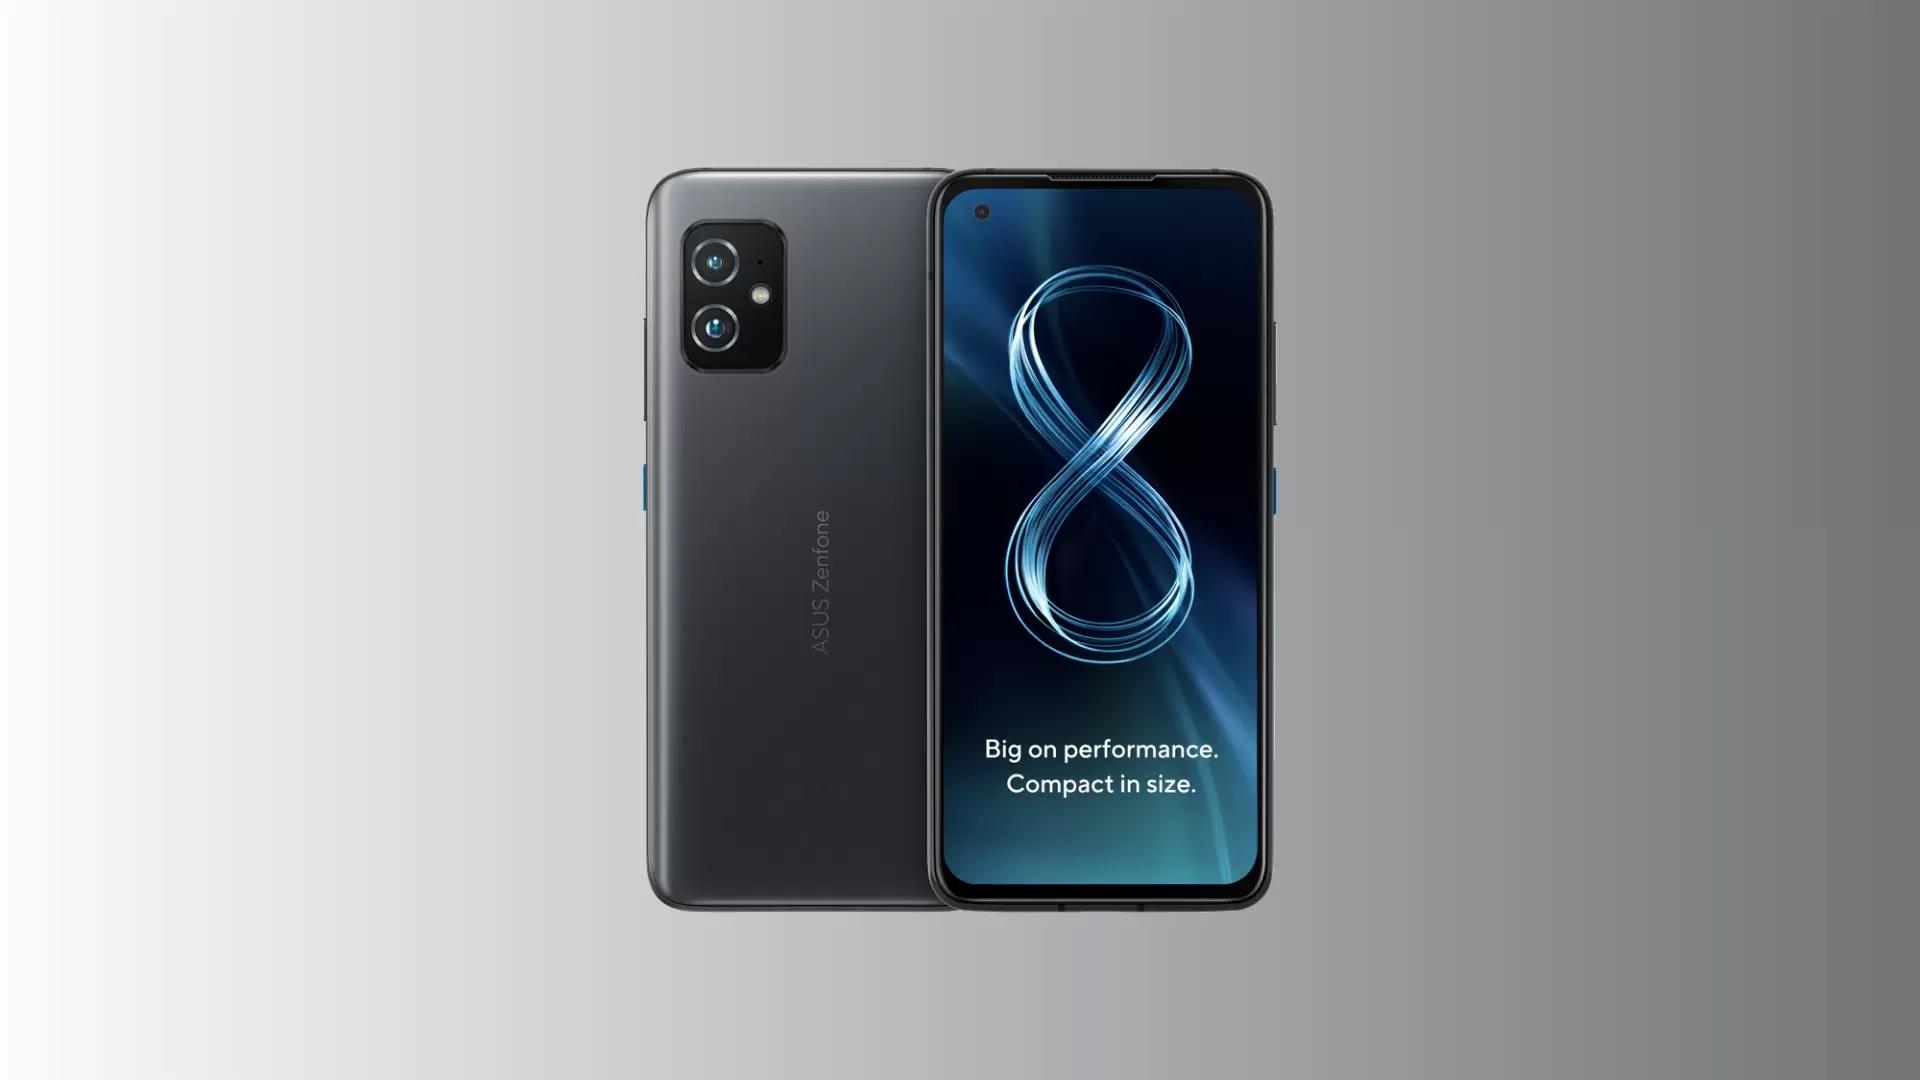 ASUS Zenfone 8 স্মার্টফোনটি হয়েছে লঞ্চ